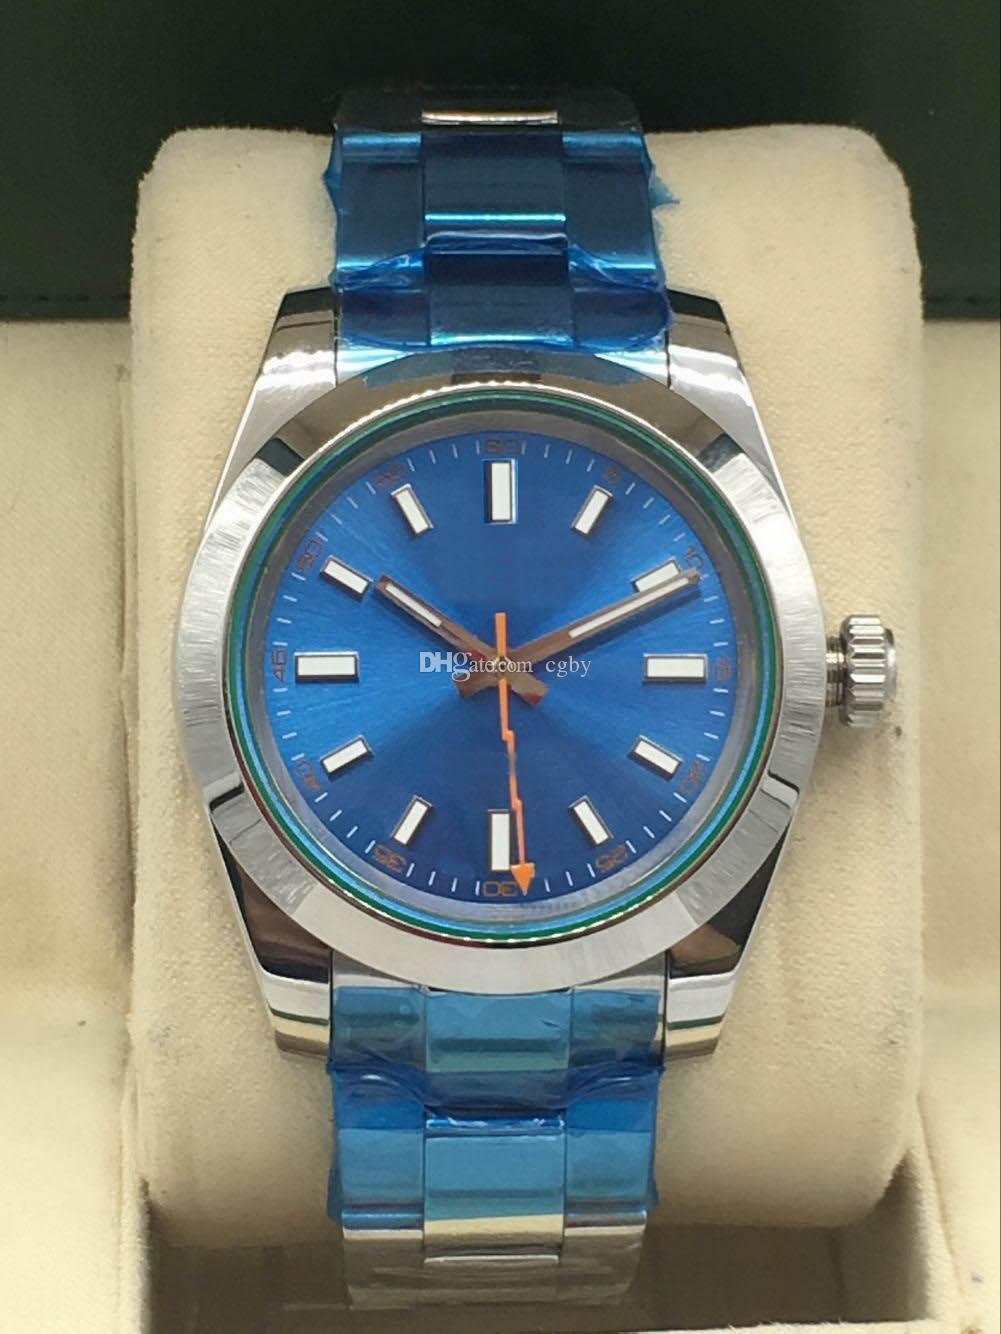 Erkekler mekanik spor watch.Luminous function.40mm paslanmaz çelik belt.M116400gv - 0002 series.Sports watch.316 material.2813 hareketi